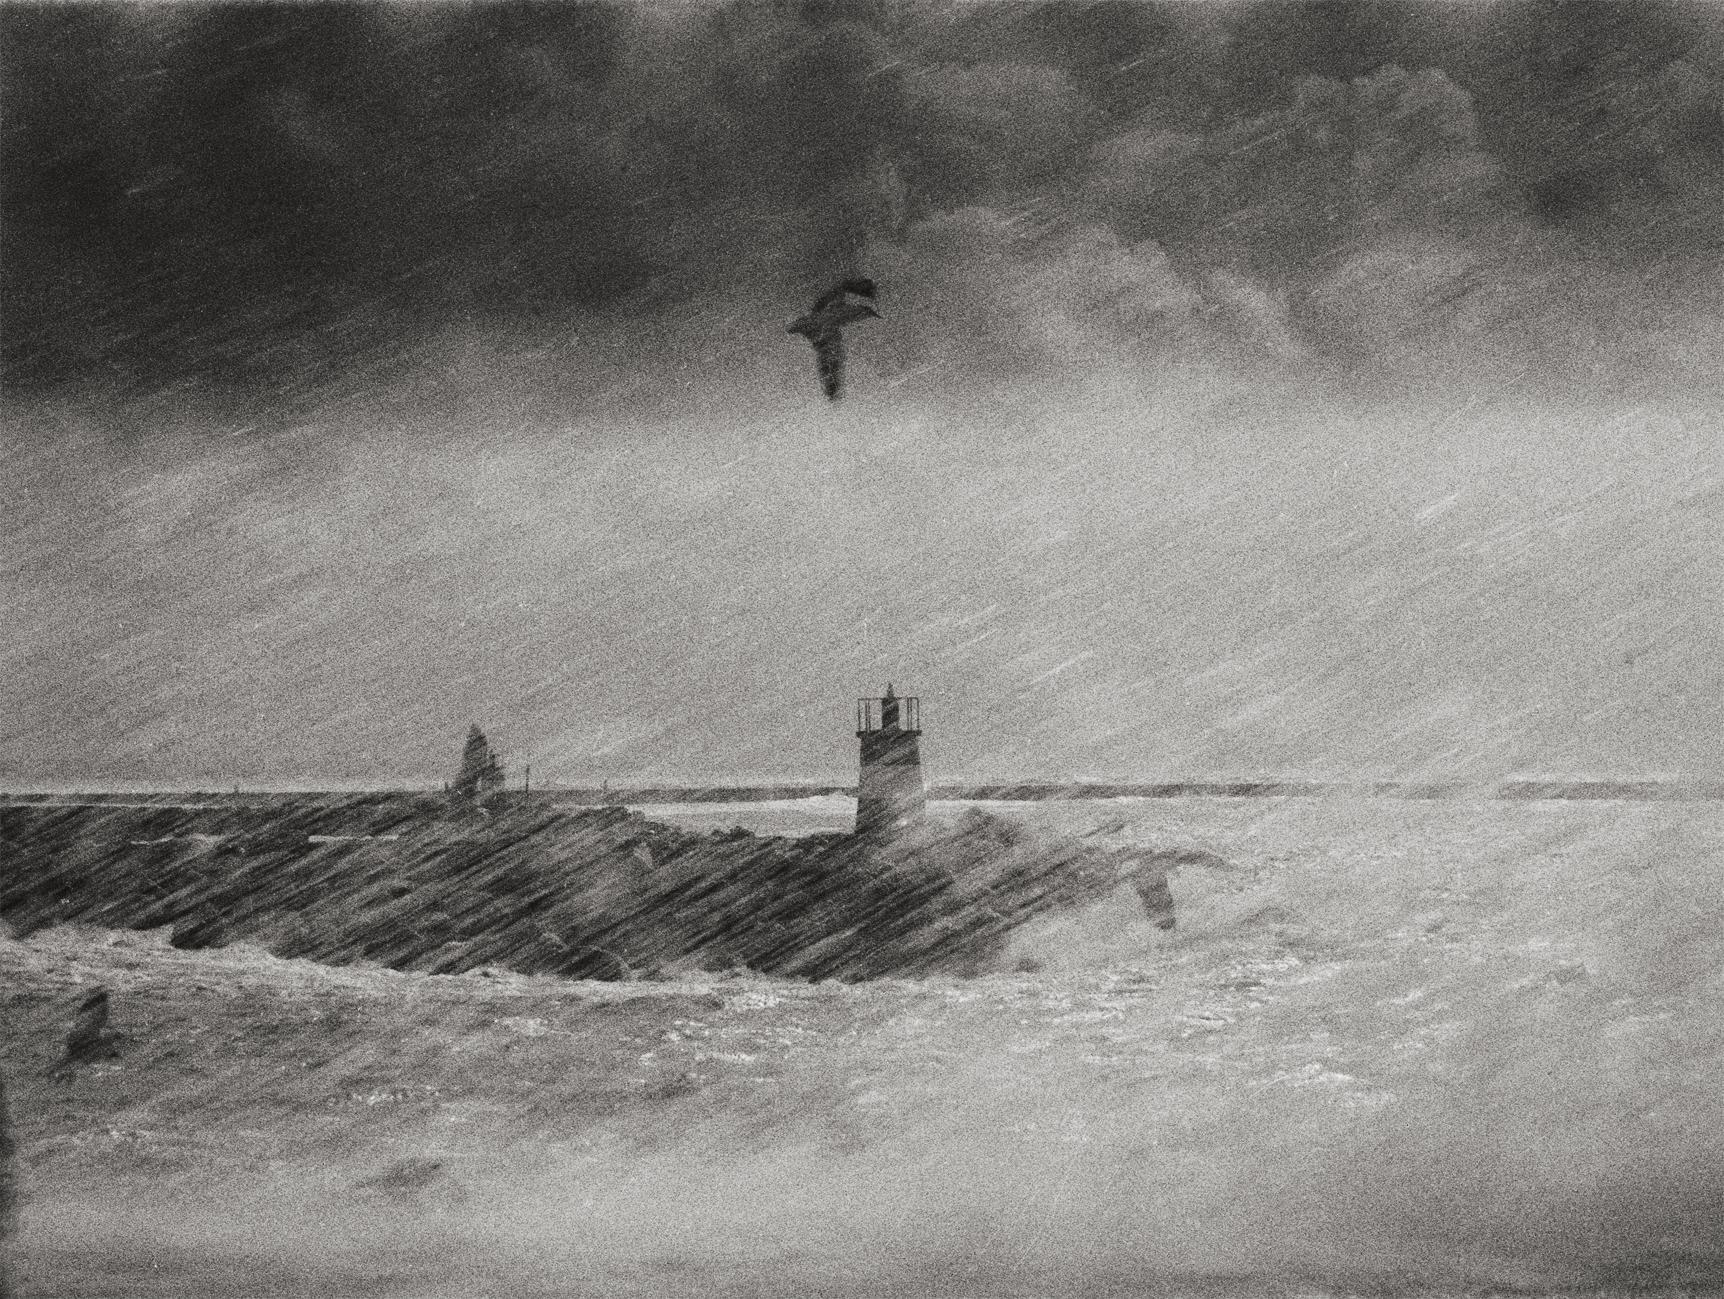 Storm, Portugal 1999 /Gelatin Silver Print/ Signed